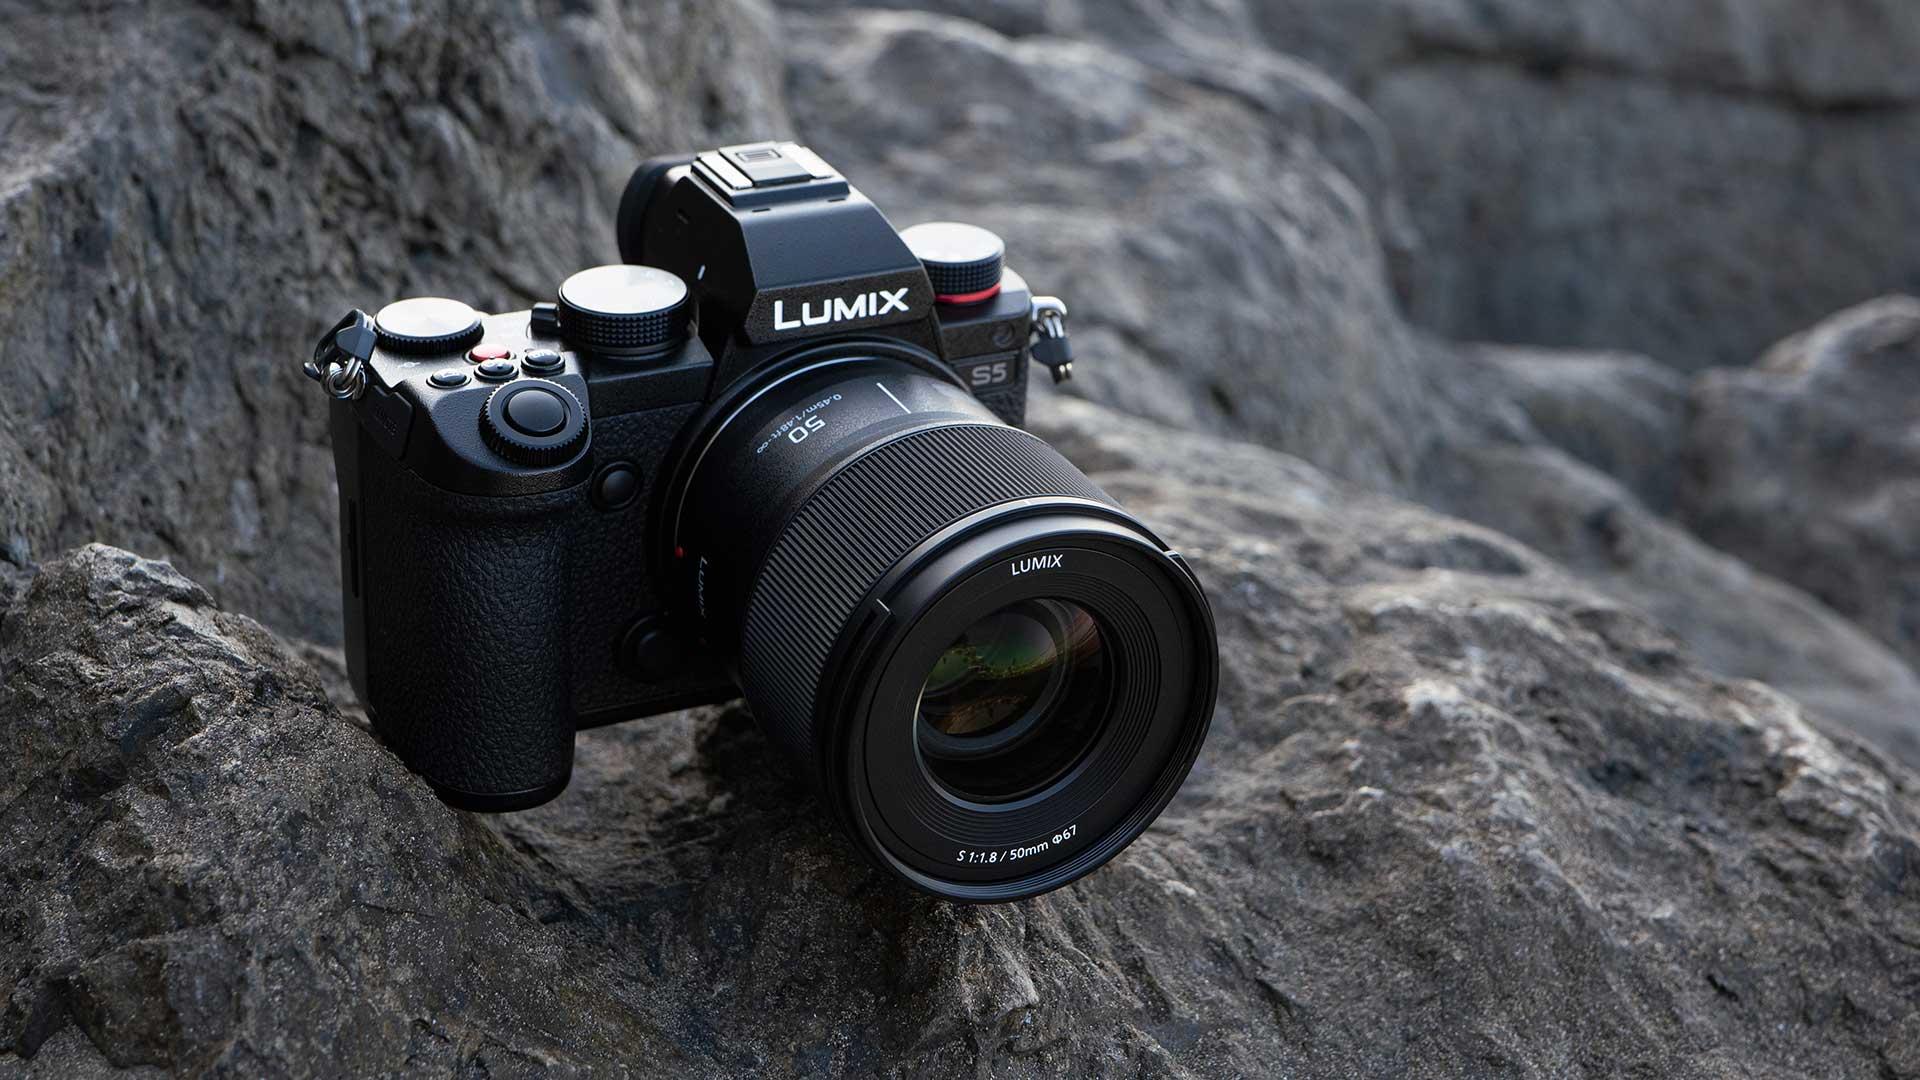 LUMIX S 50mm F1-8 Lens